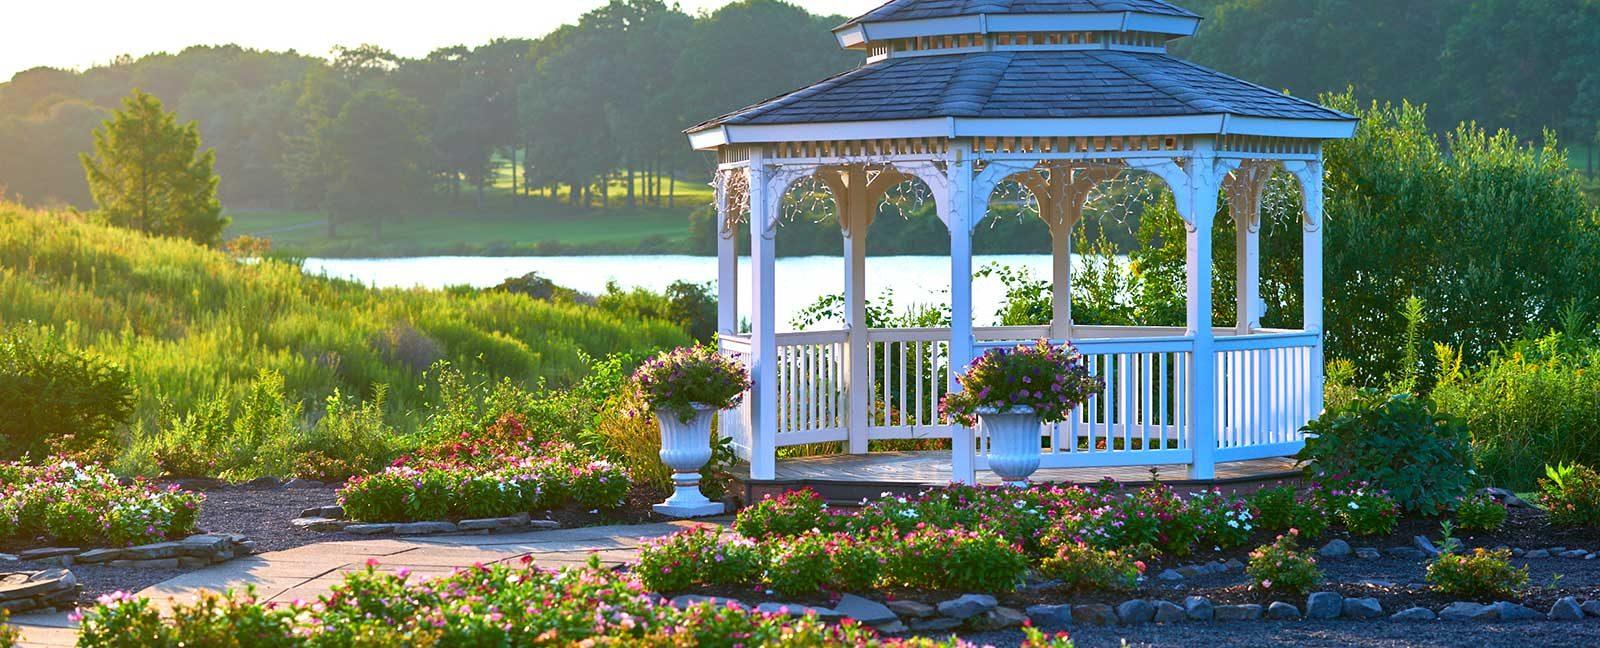 outdoor wedding venue PA gazebo